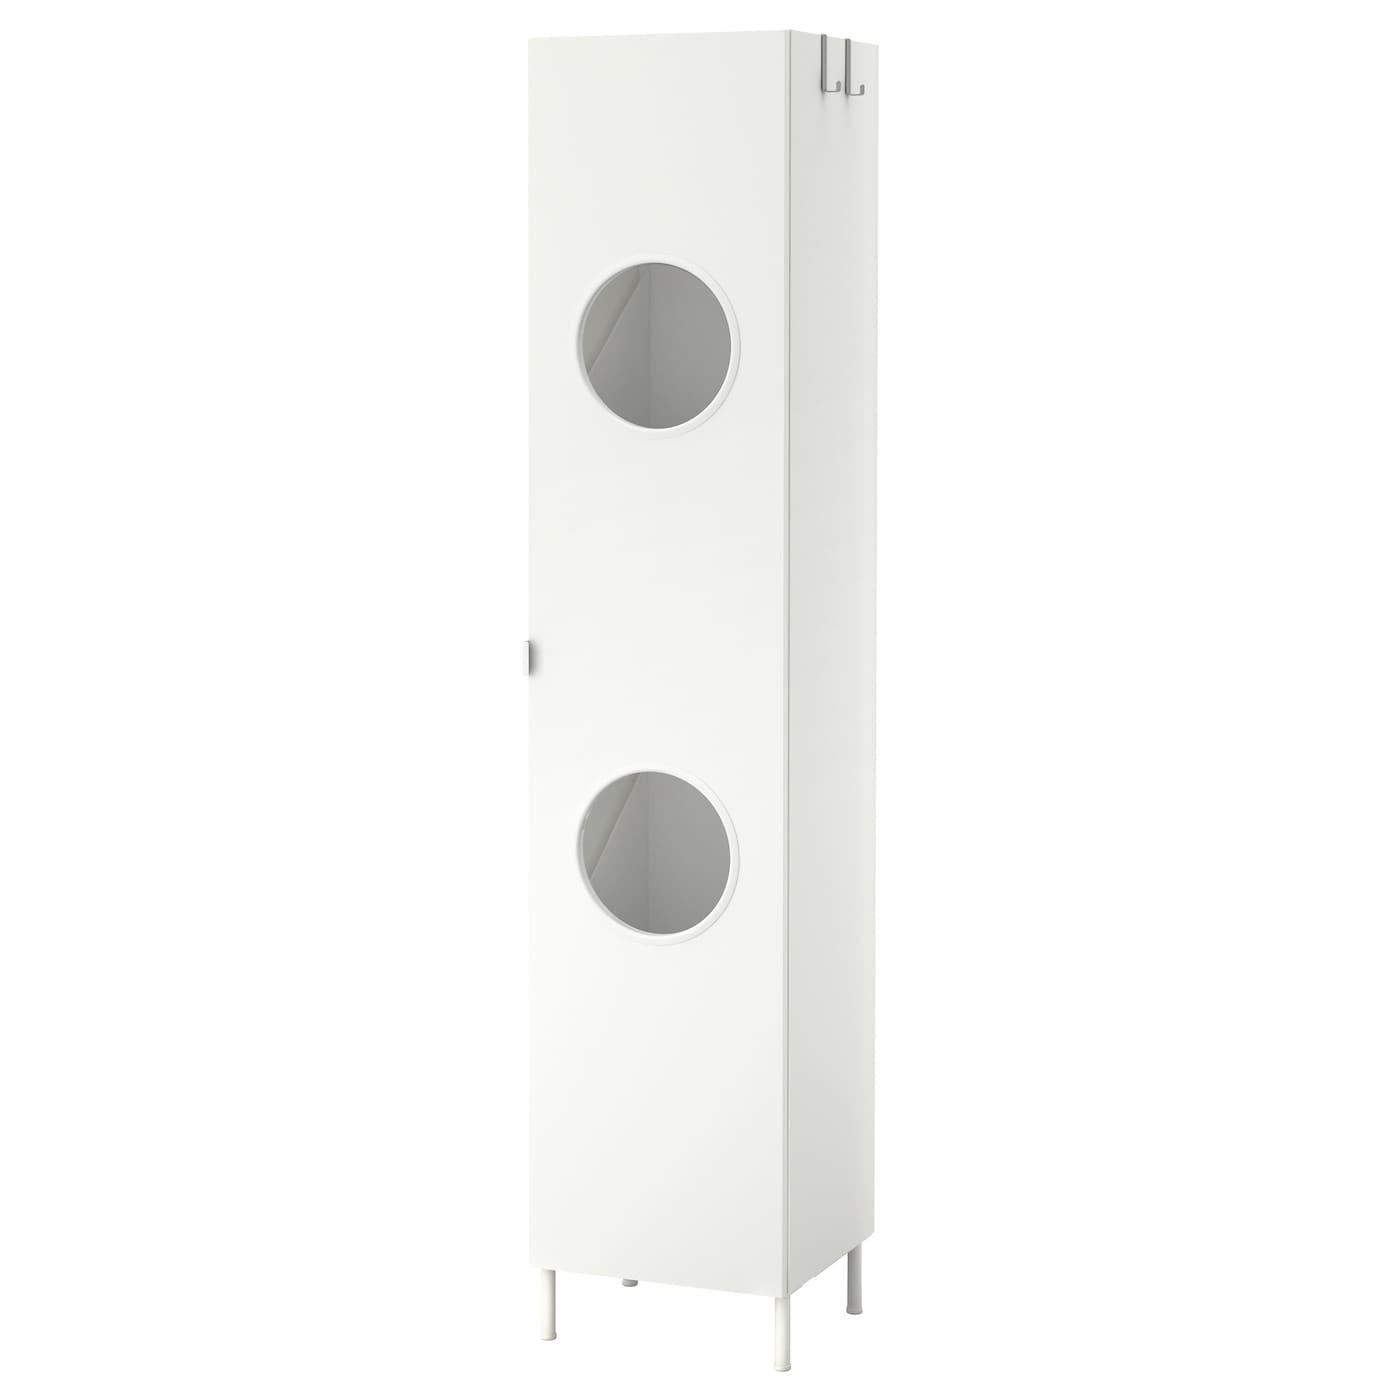 Lill ngen armario para colada blanco 40 x 38 x 189 cm ikea for Armario almacenaje bano